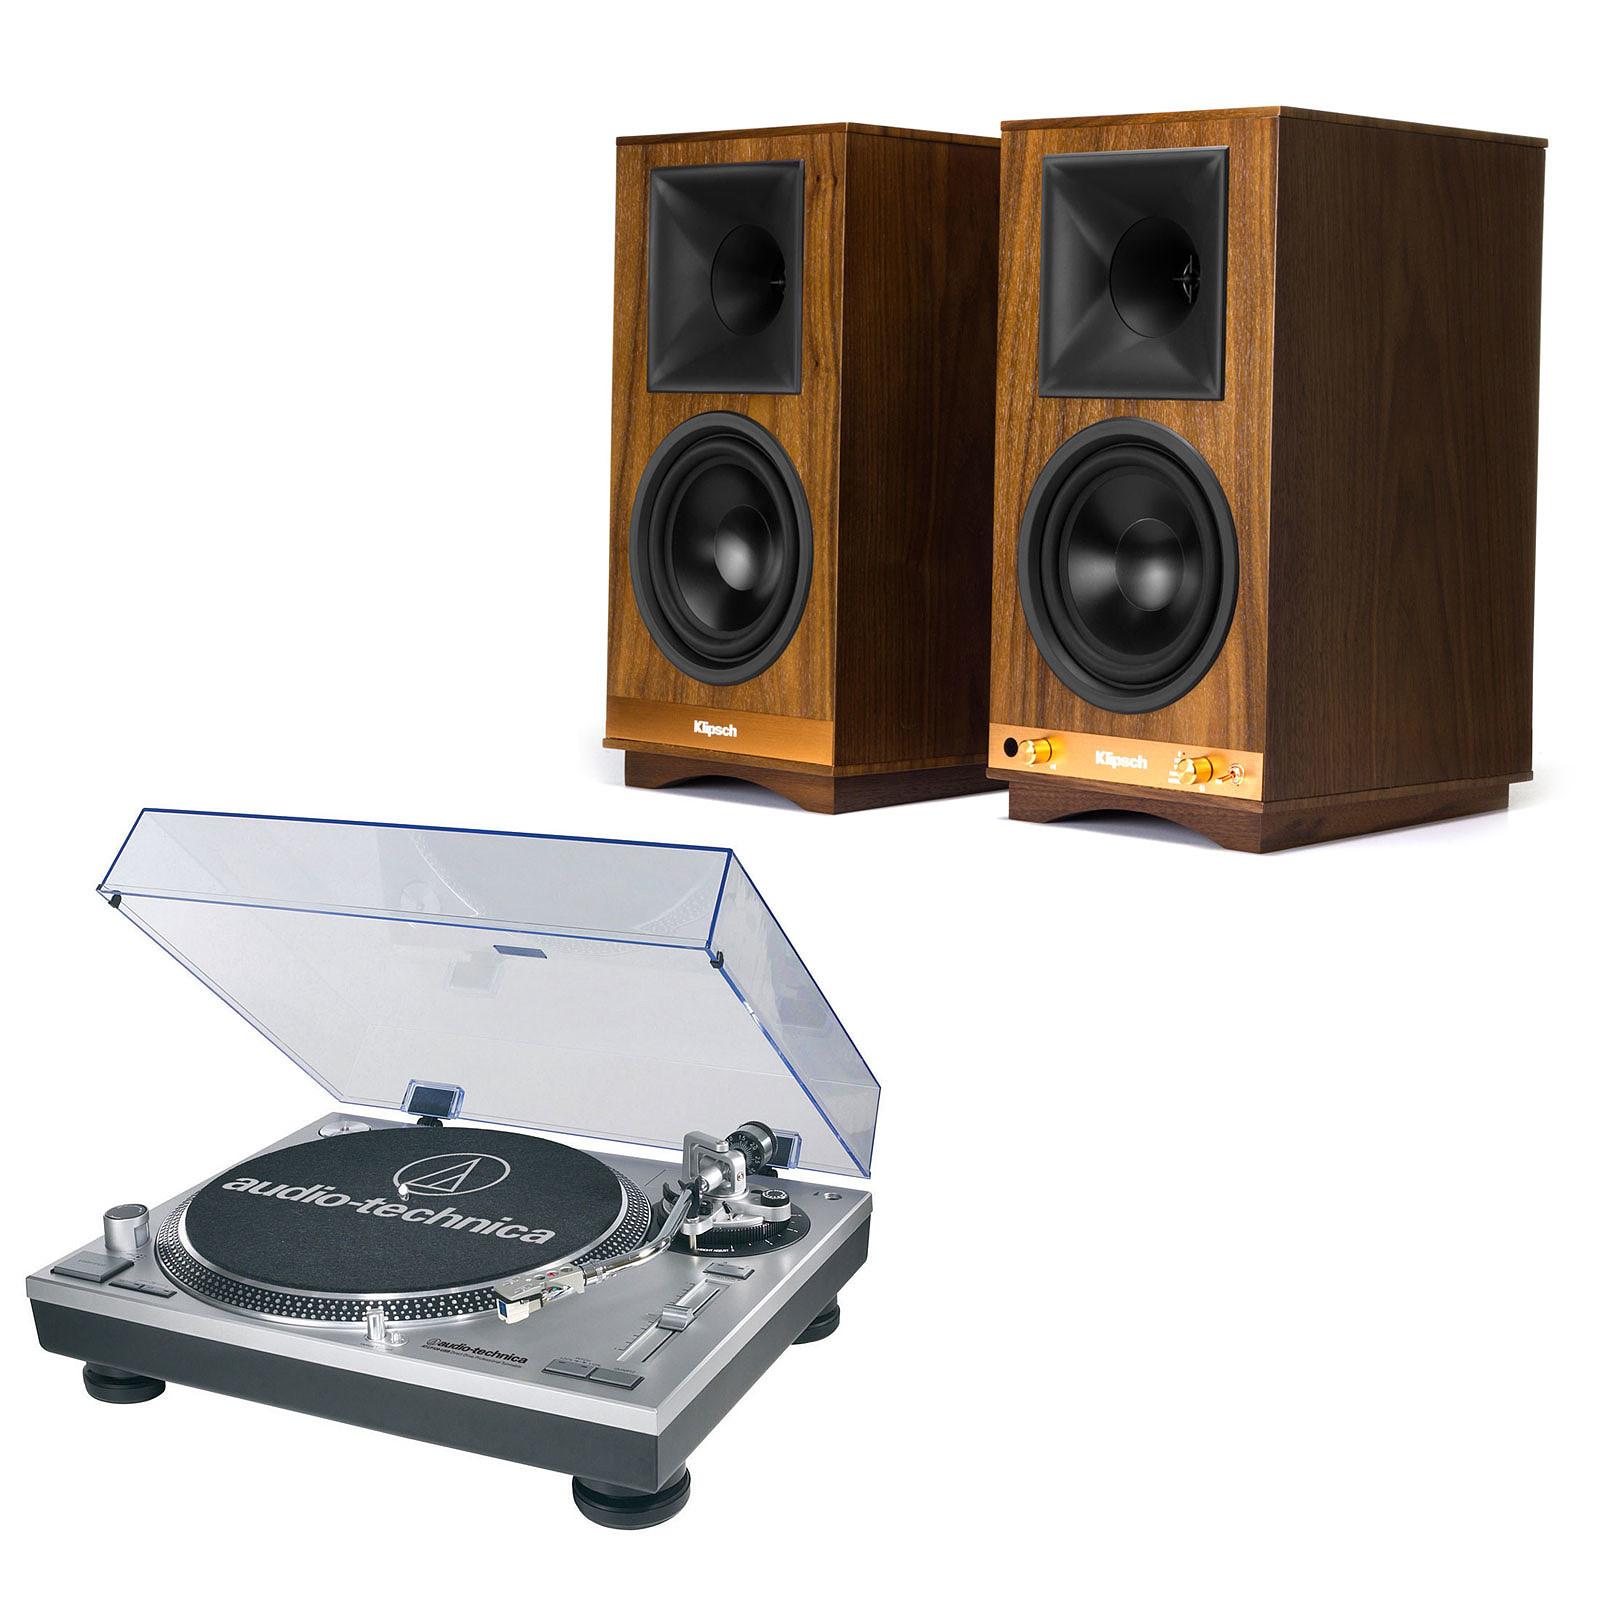 Audio-Technica AT-LP120USBHC + Klipsch The Sixes